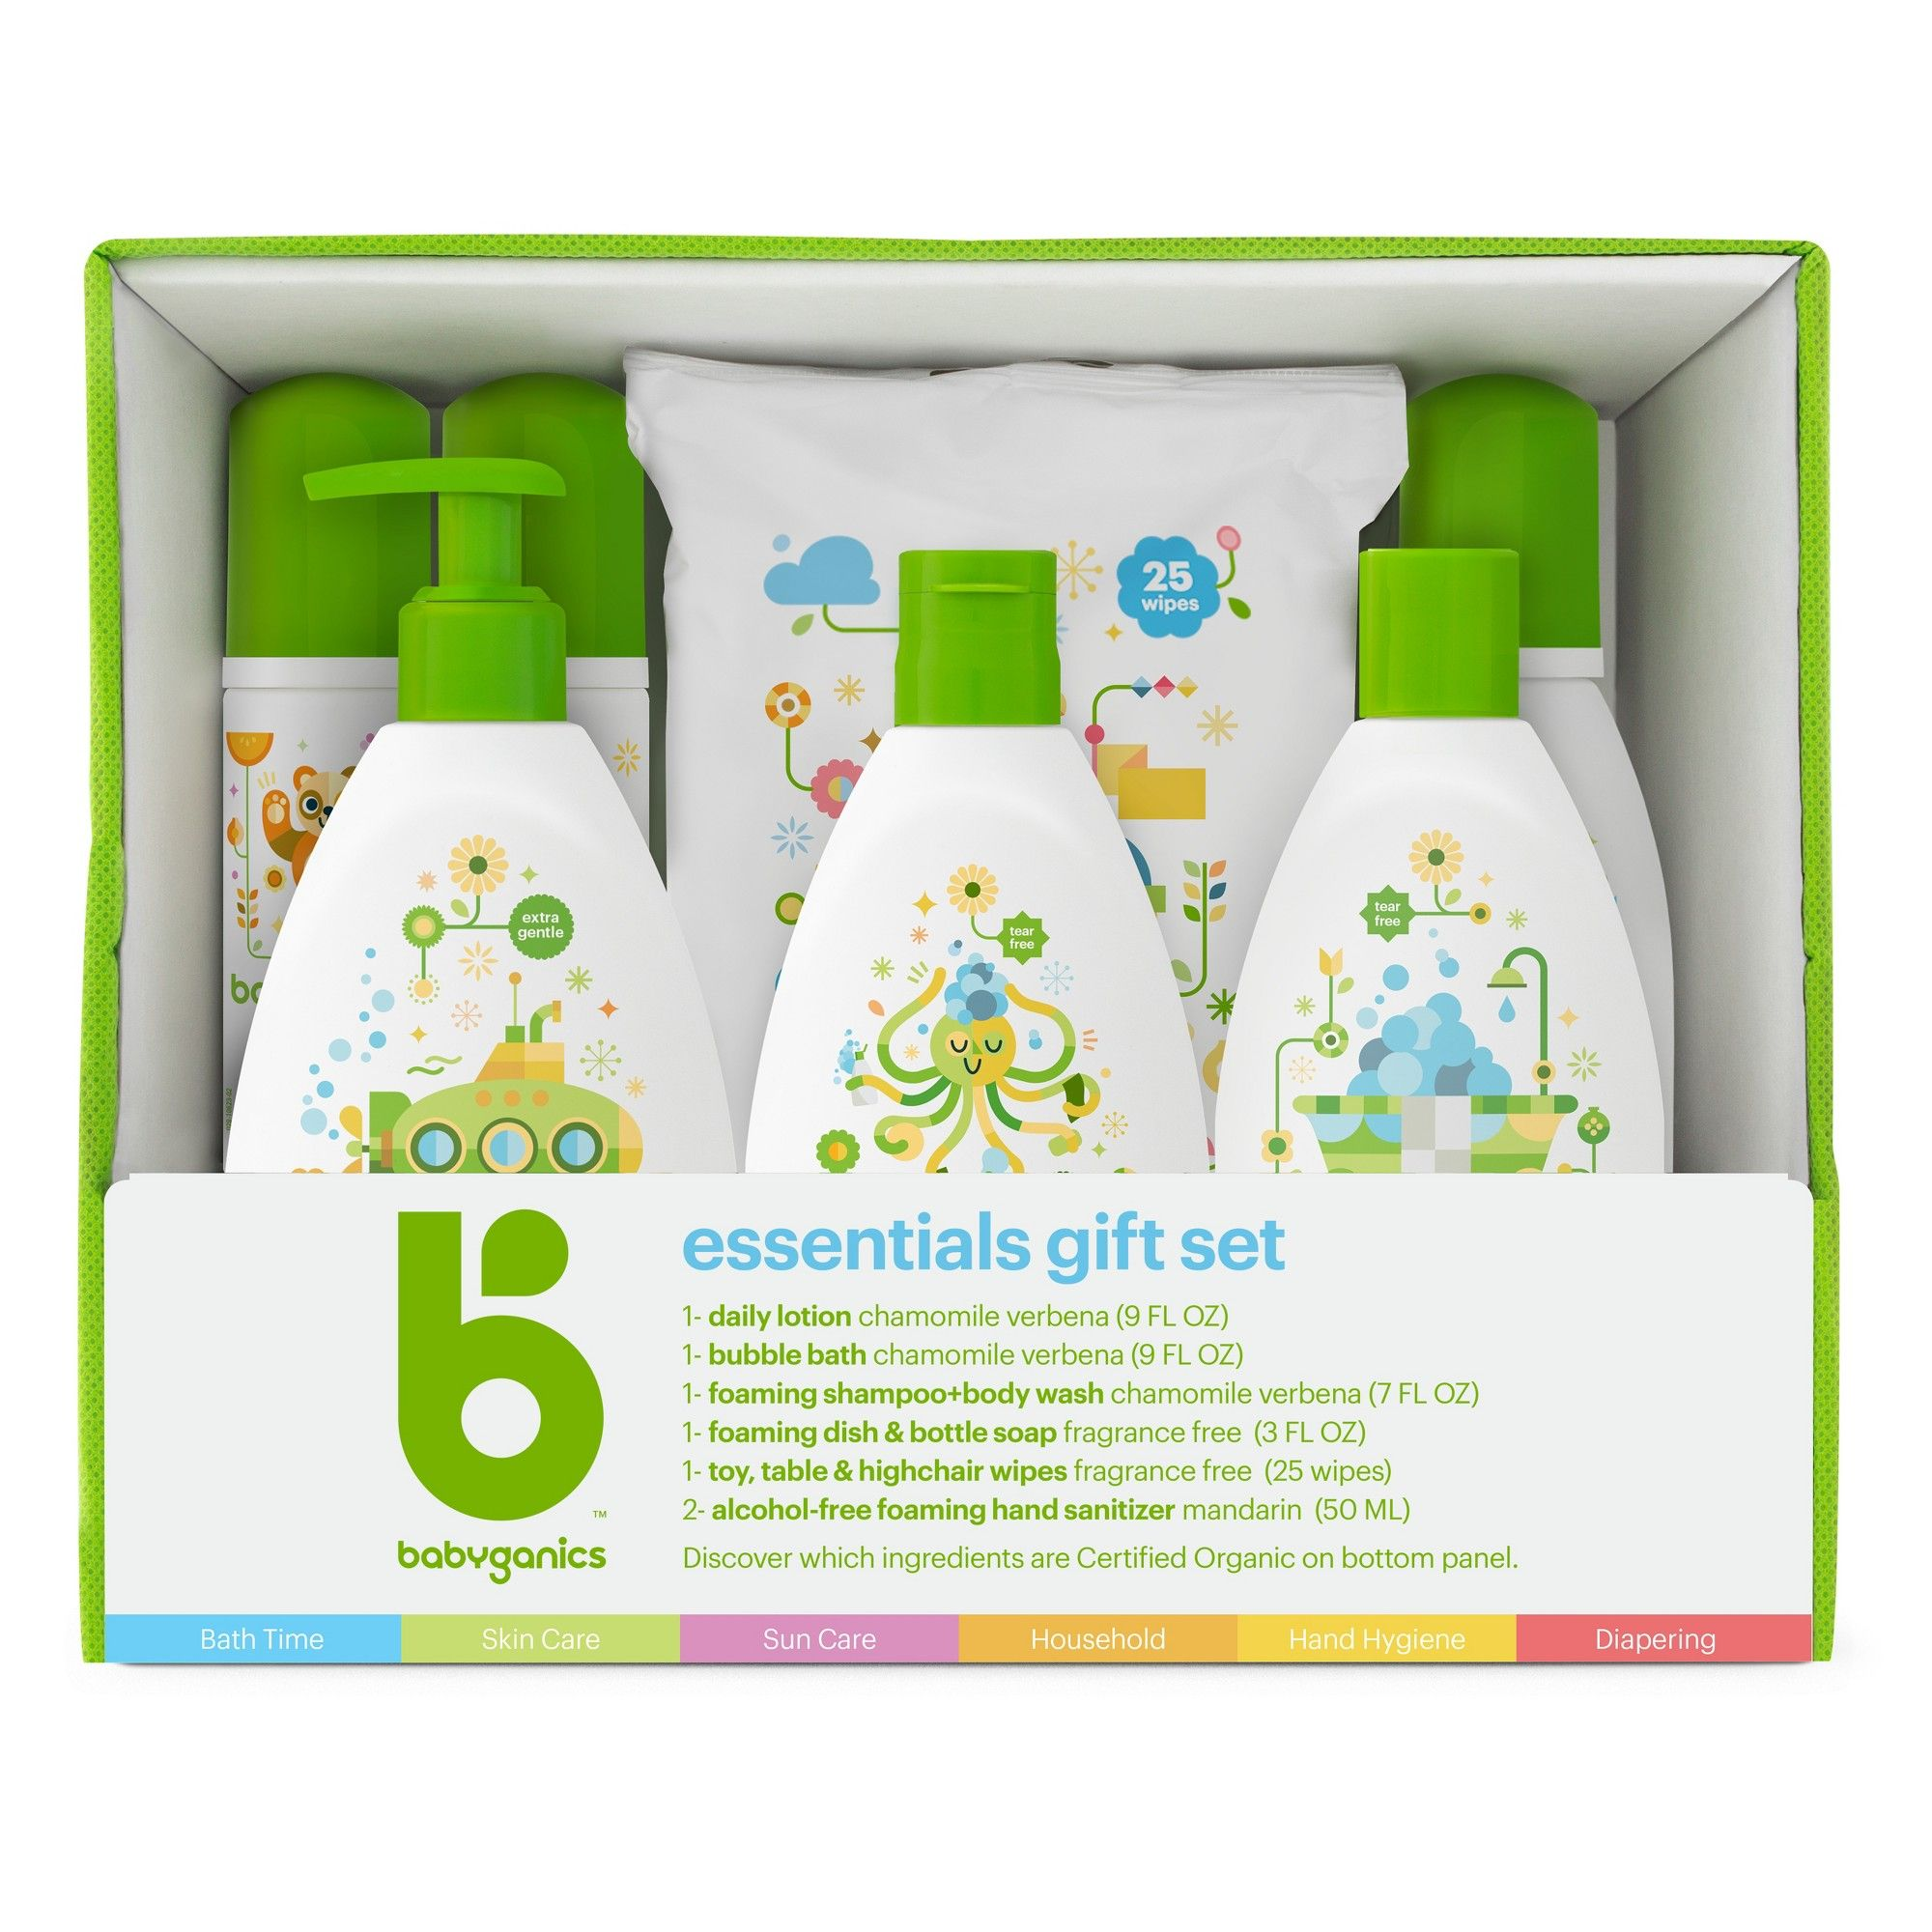 Babyganics Essentials Gift Set Babyganics Gift Set Fragrance